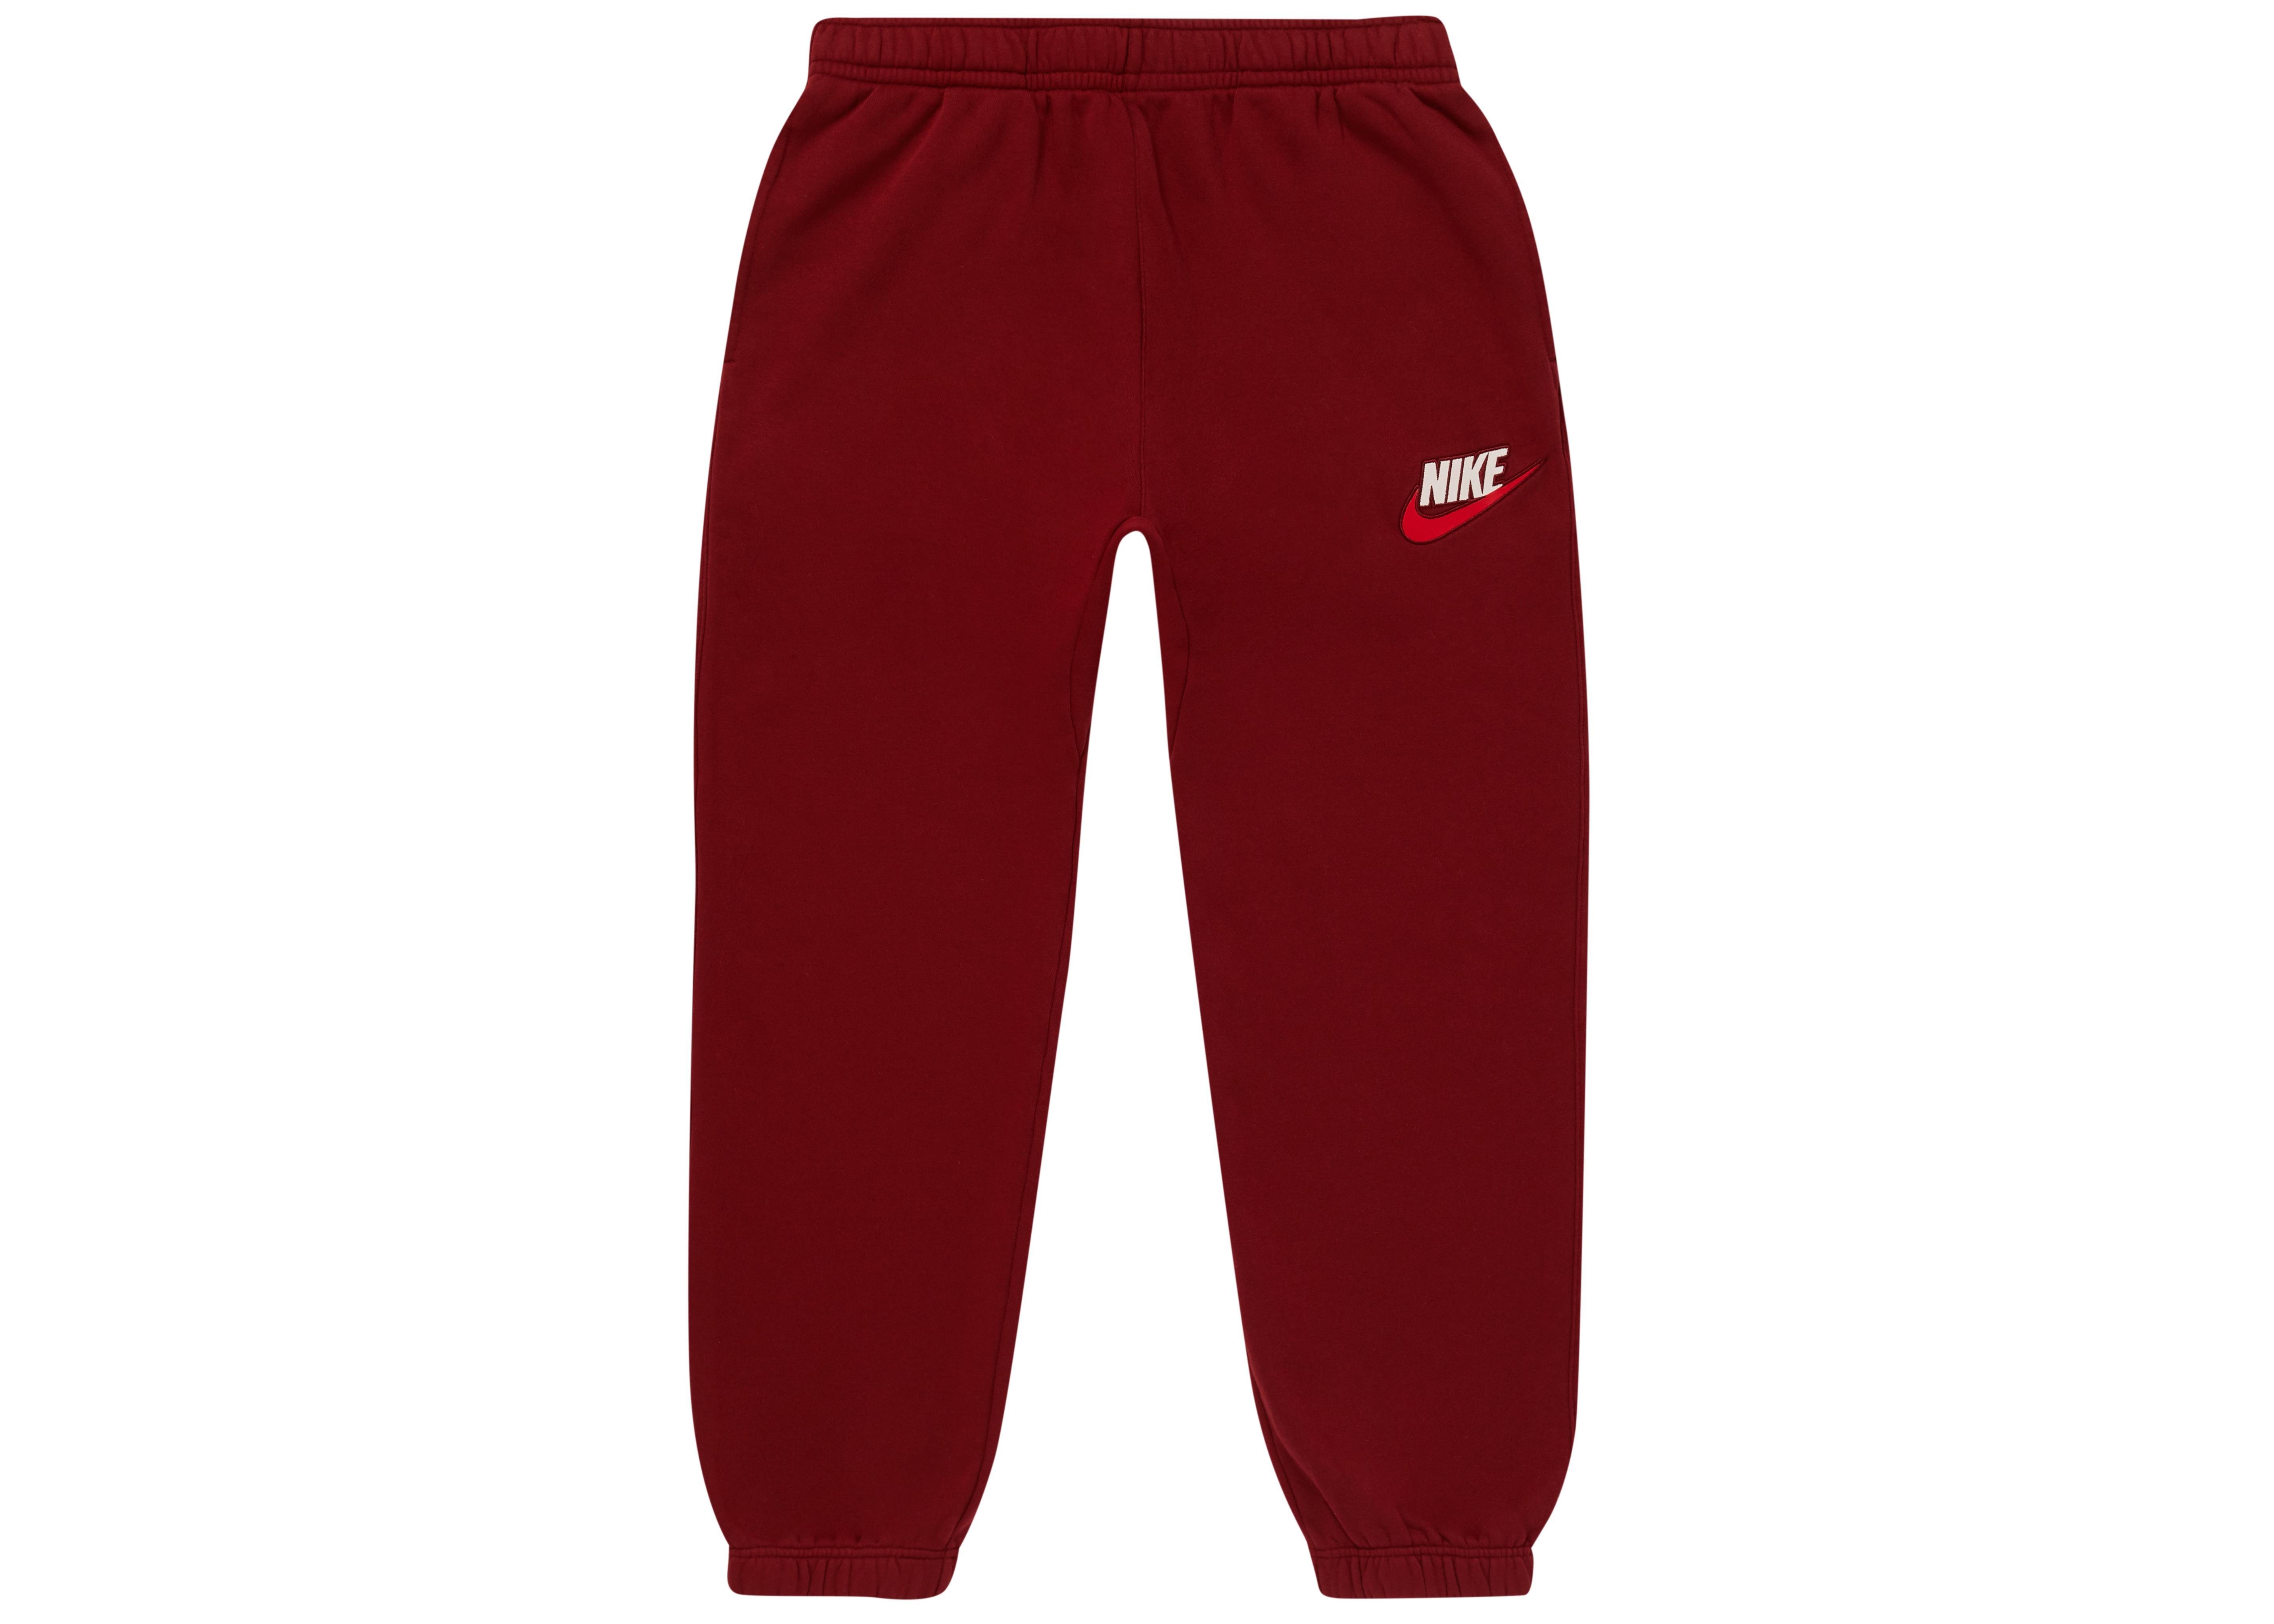 ccfea193 Supreme - Red Nike Sweatpant Burgundy for Men - Lyst. View fullscreen